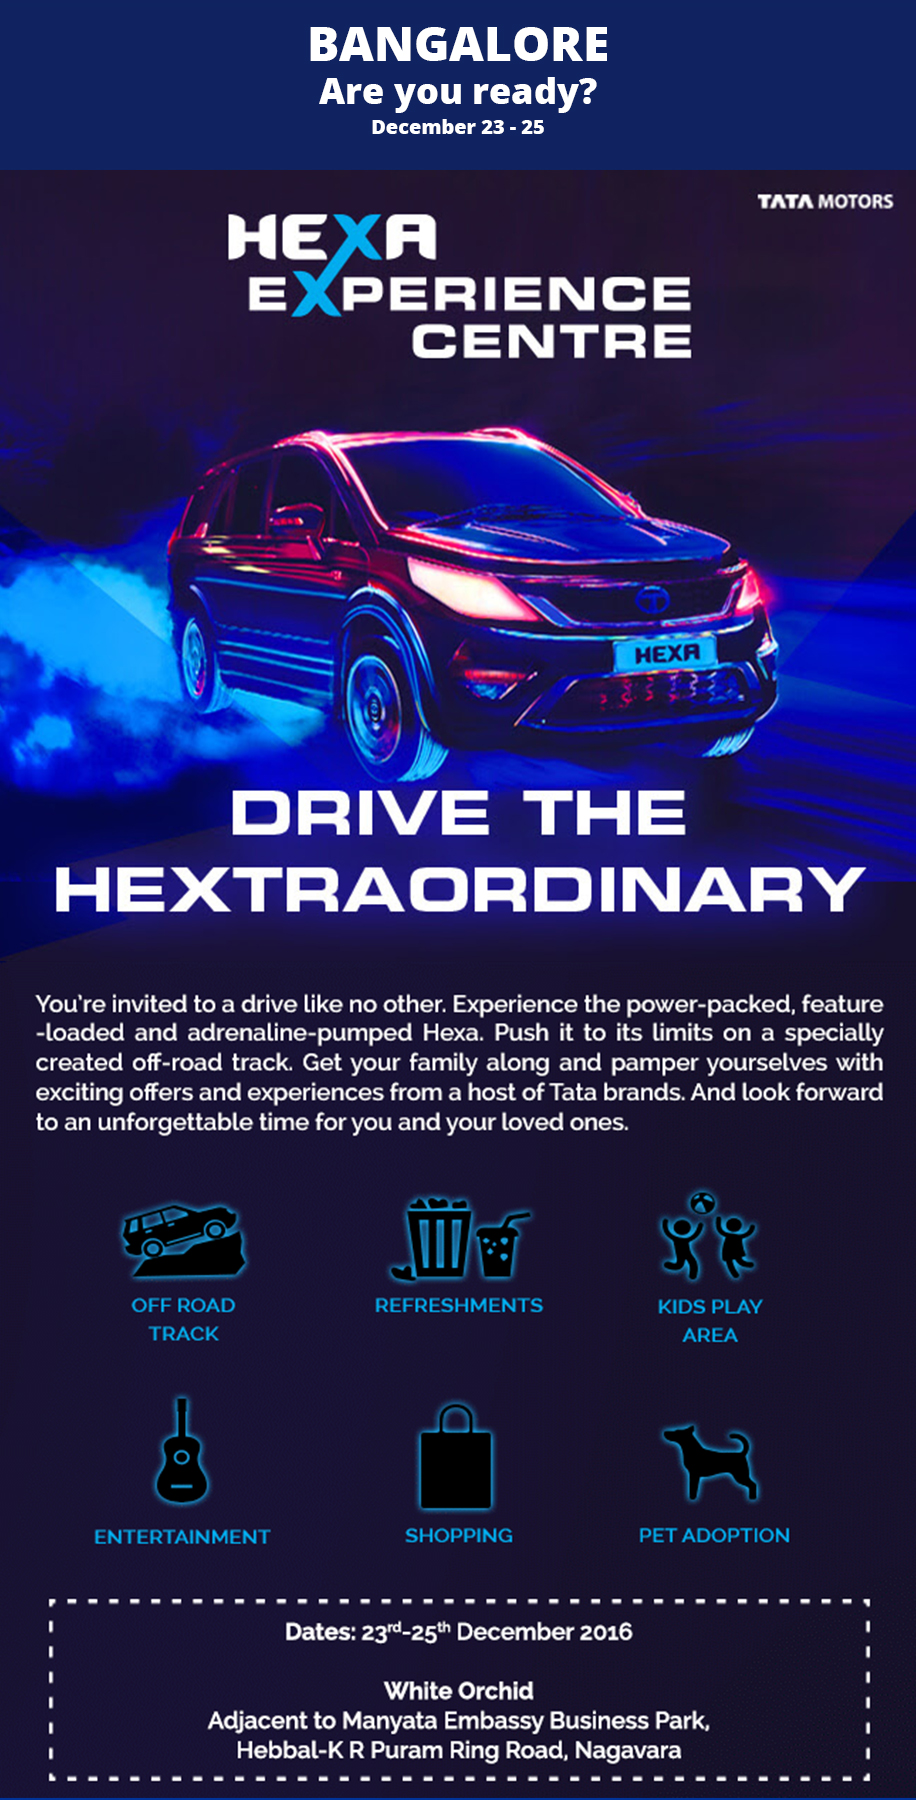 #hexaexperience